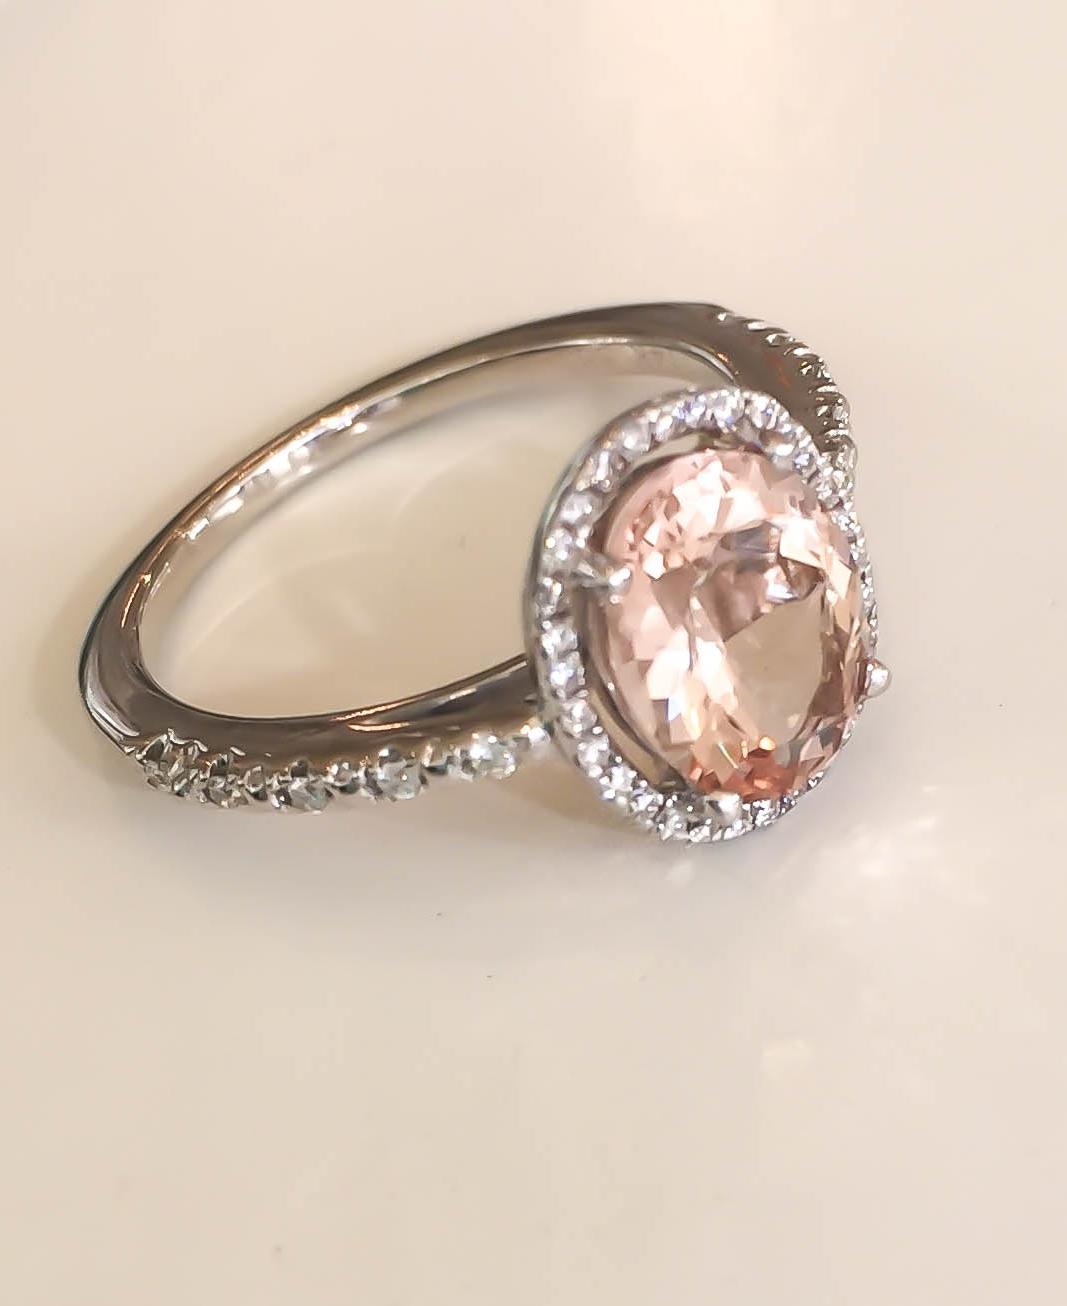 Oval morganite halo diamond ring